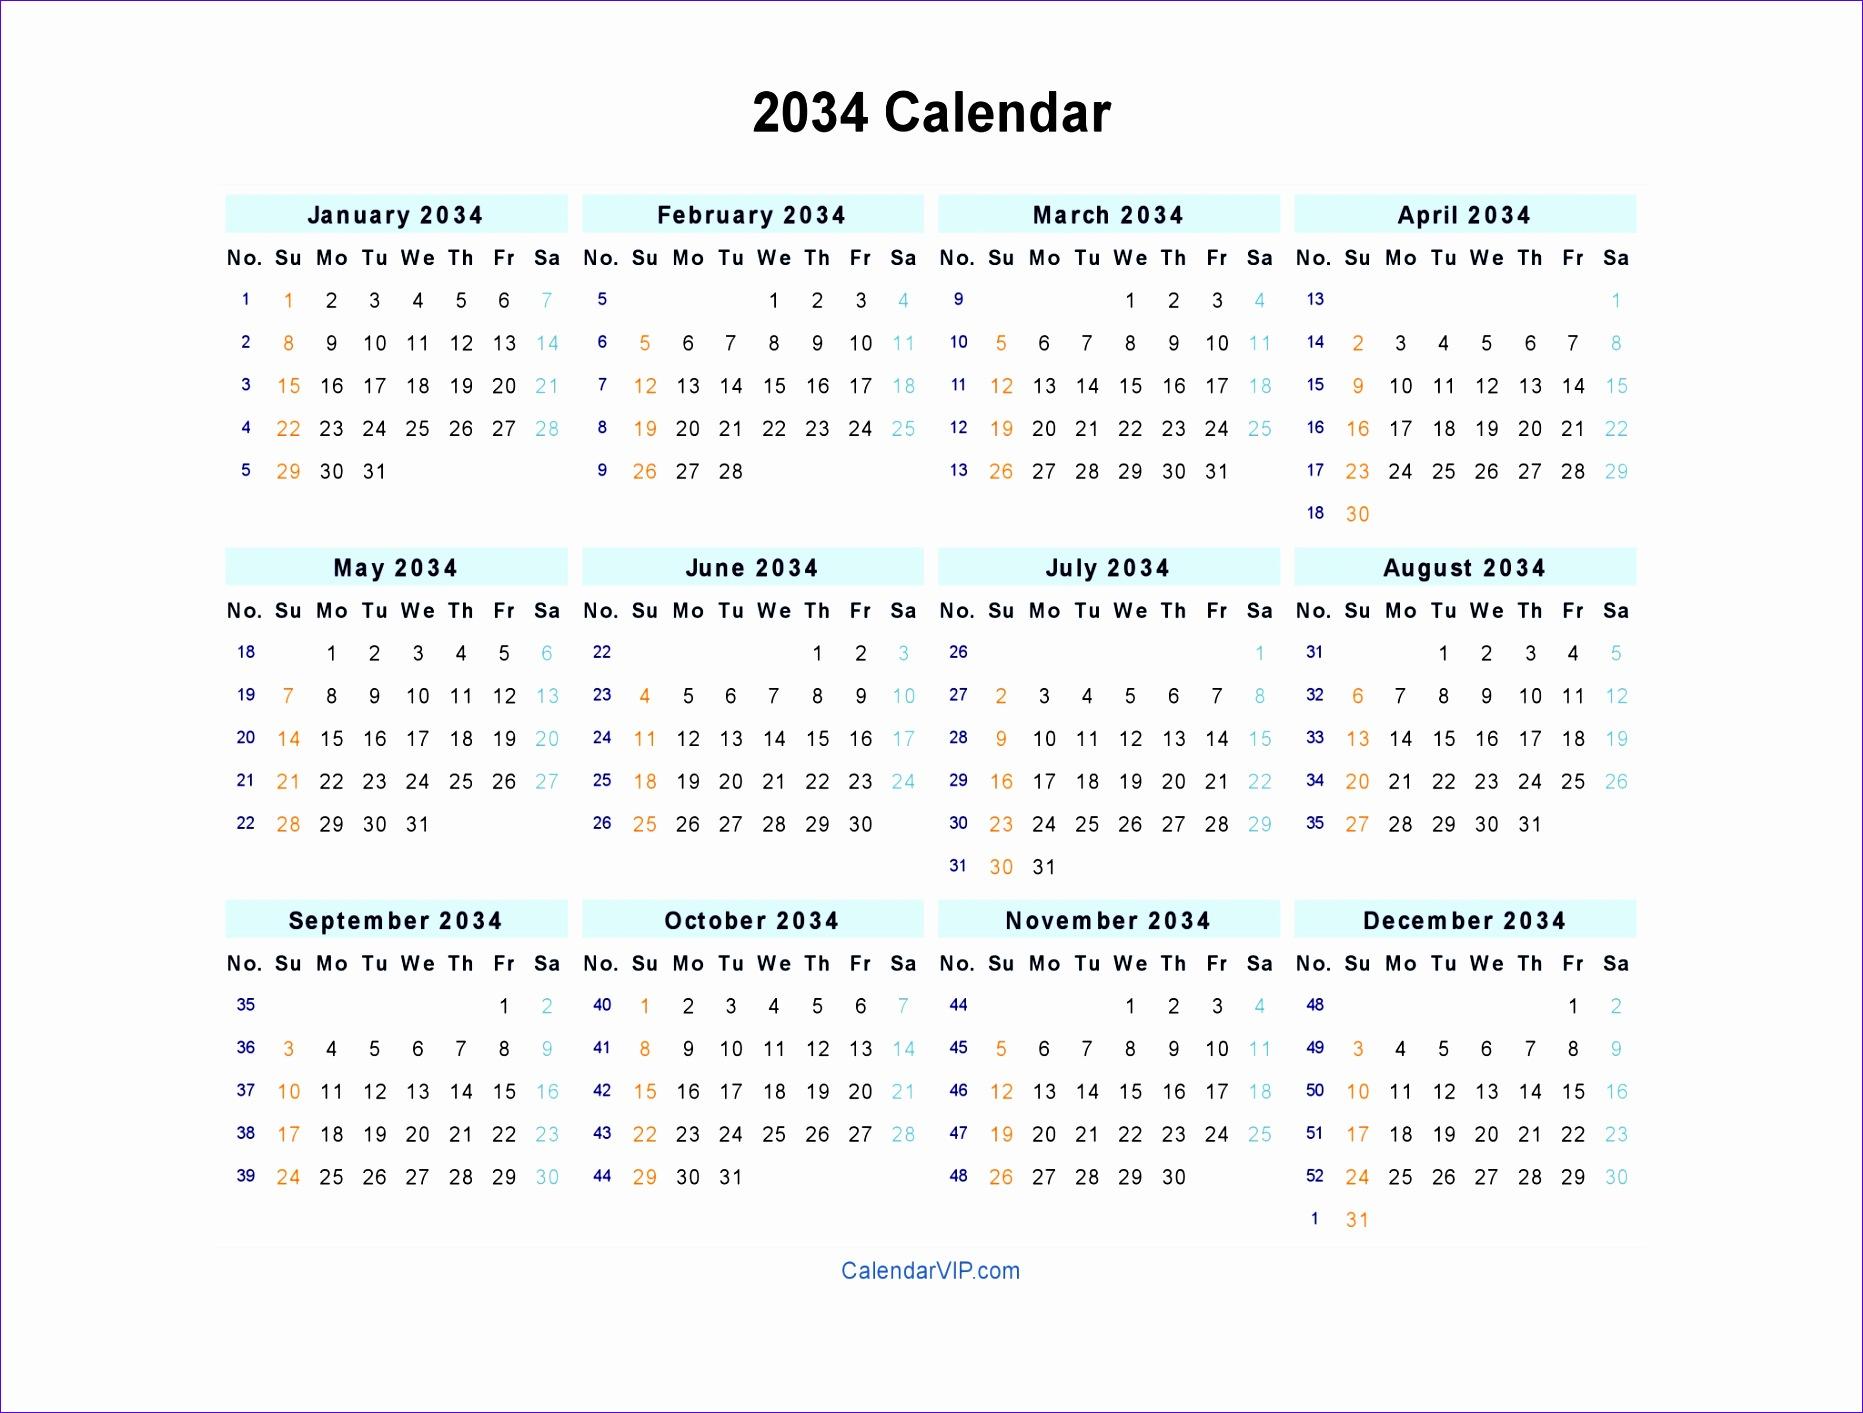 2034 calendar